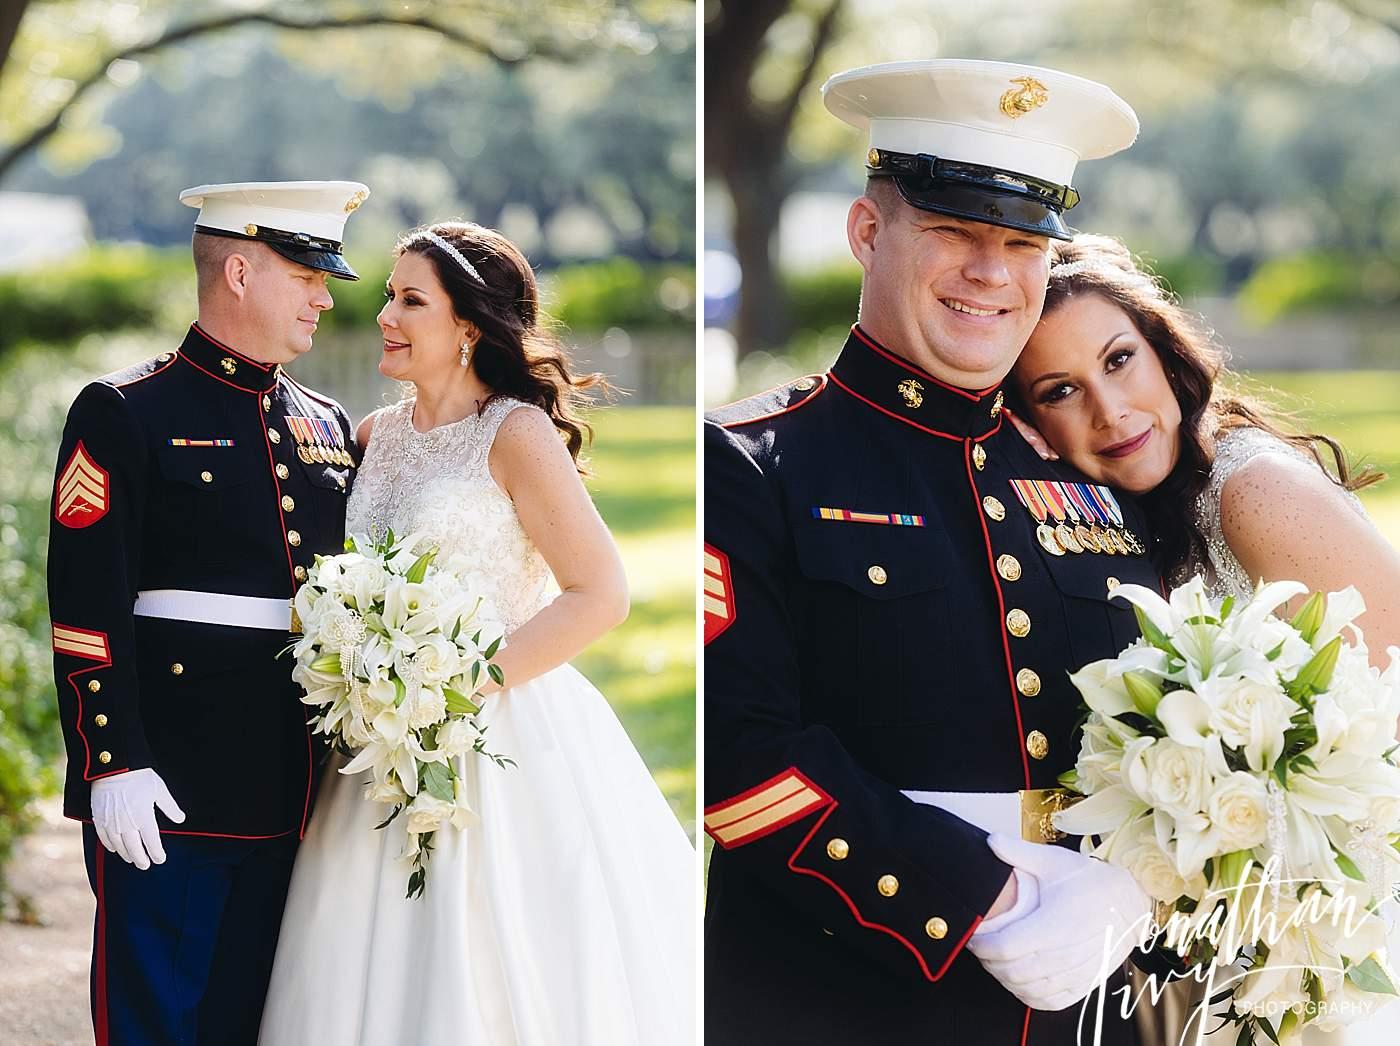 Military Bride and Groom Marines